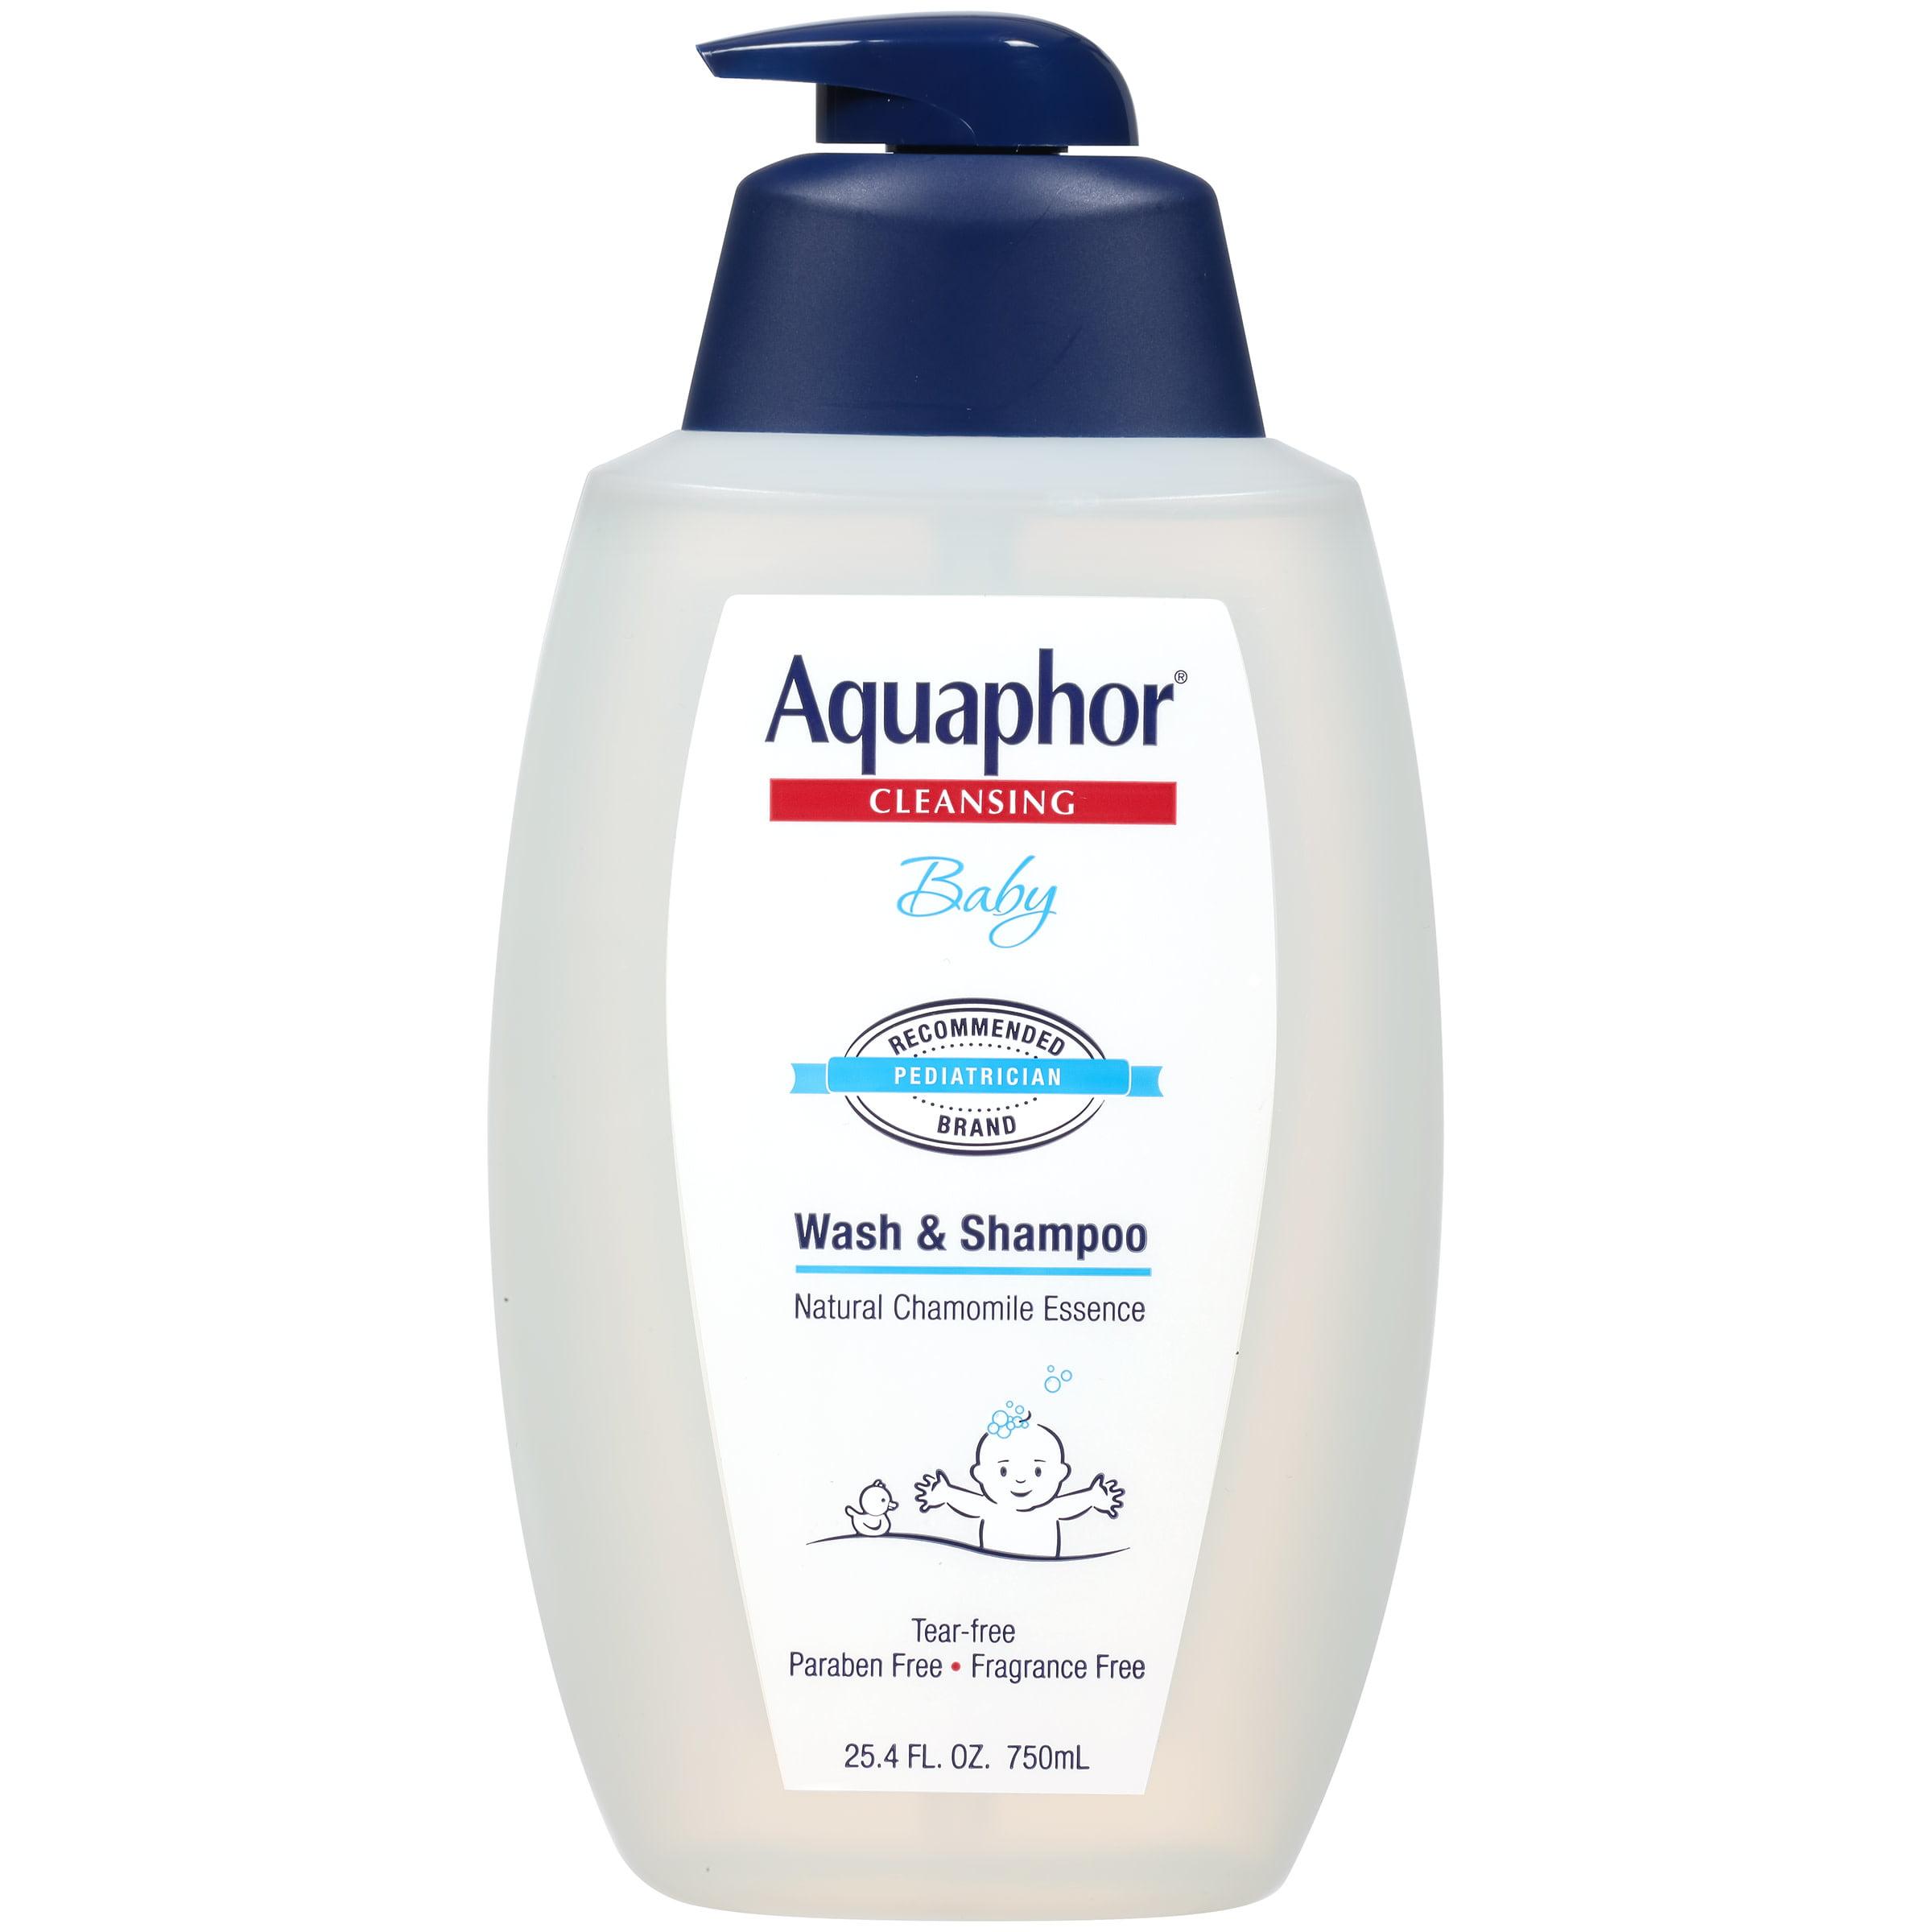 Aquaphor Baby Wash & Shampoo 25.4 fl. oz.